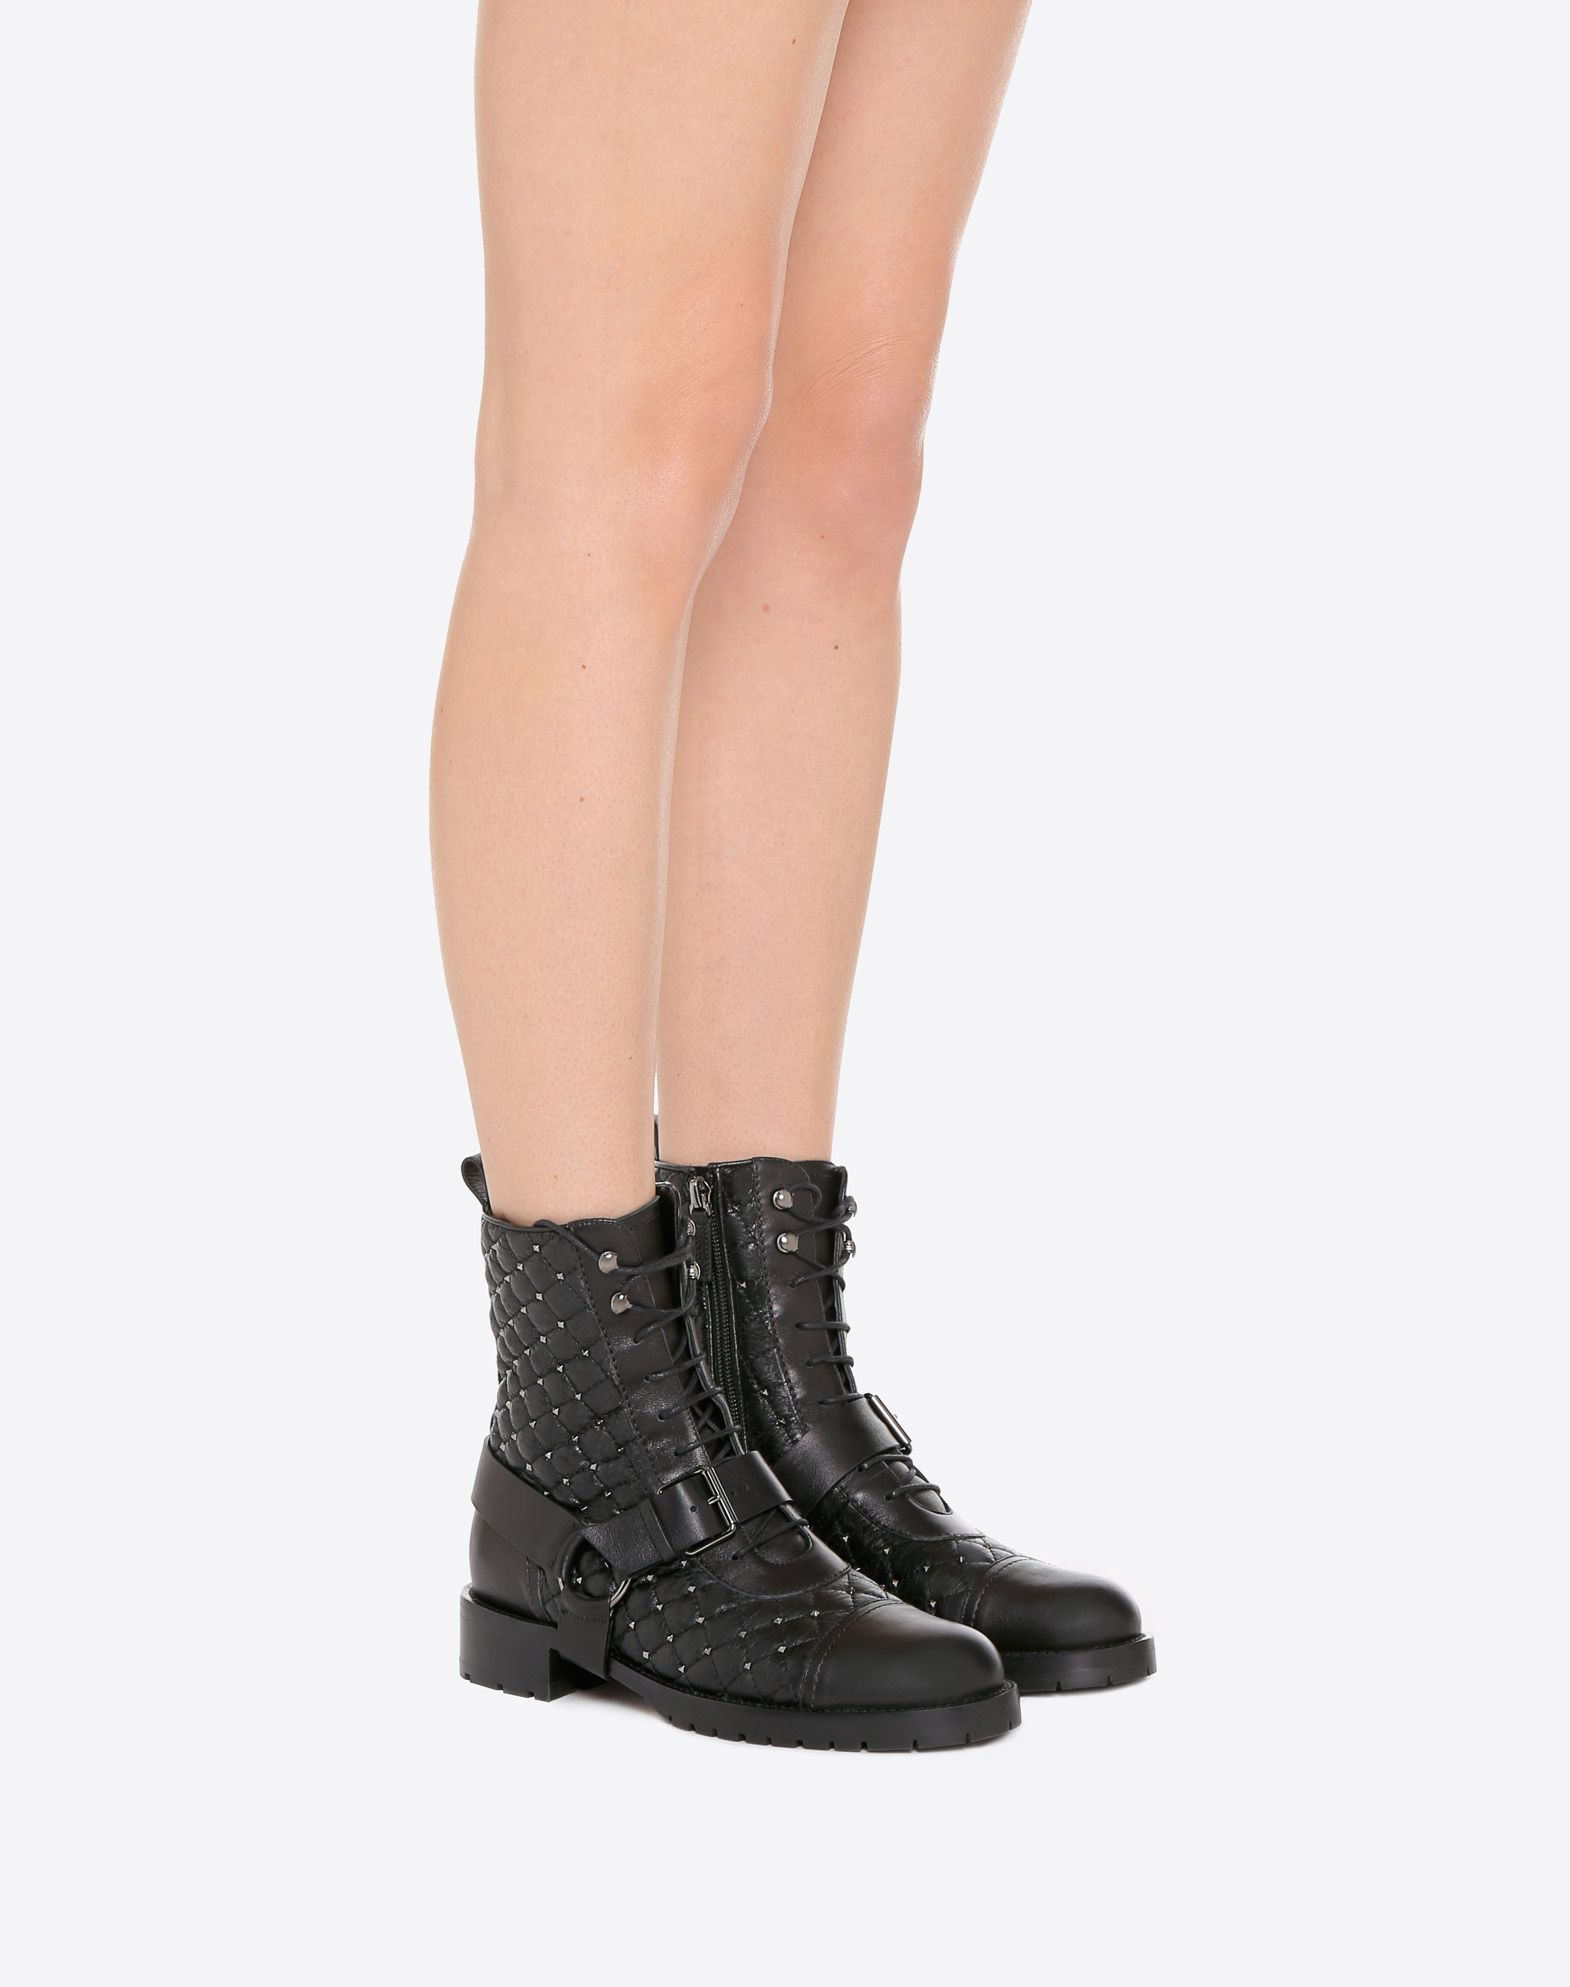 ValentinoWomen's Rockstud Quilted Combat Boot